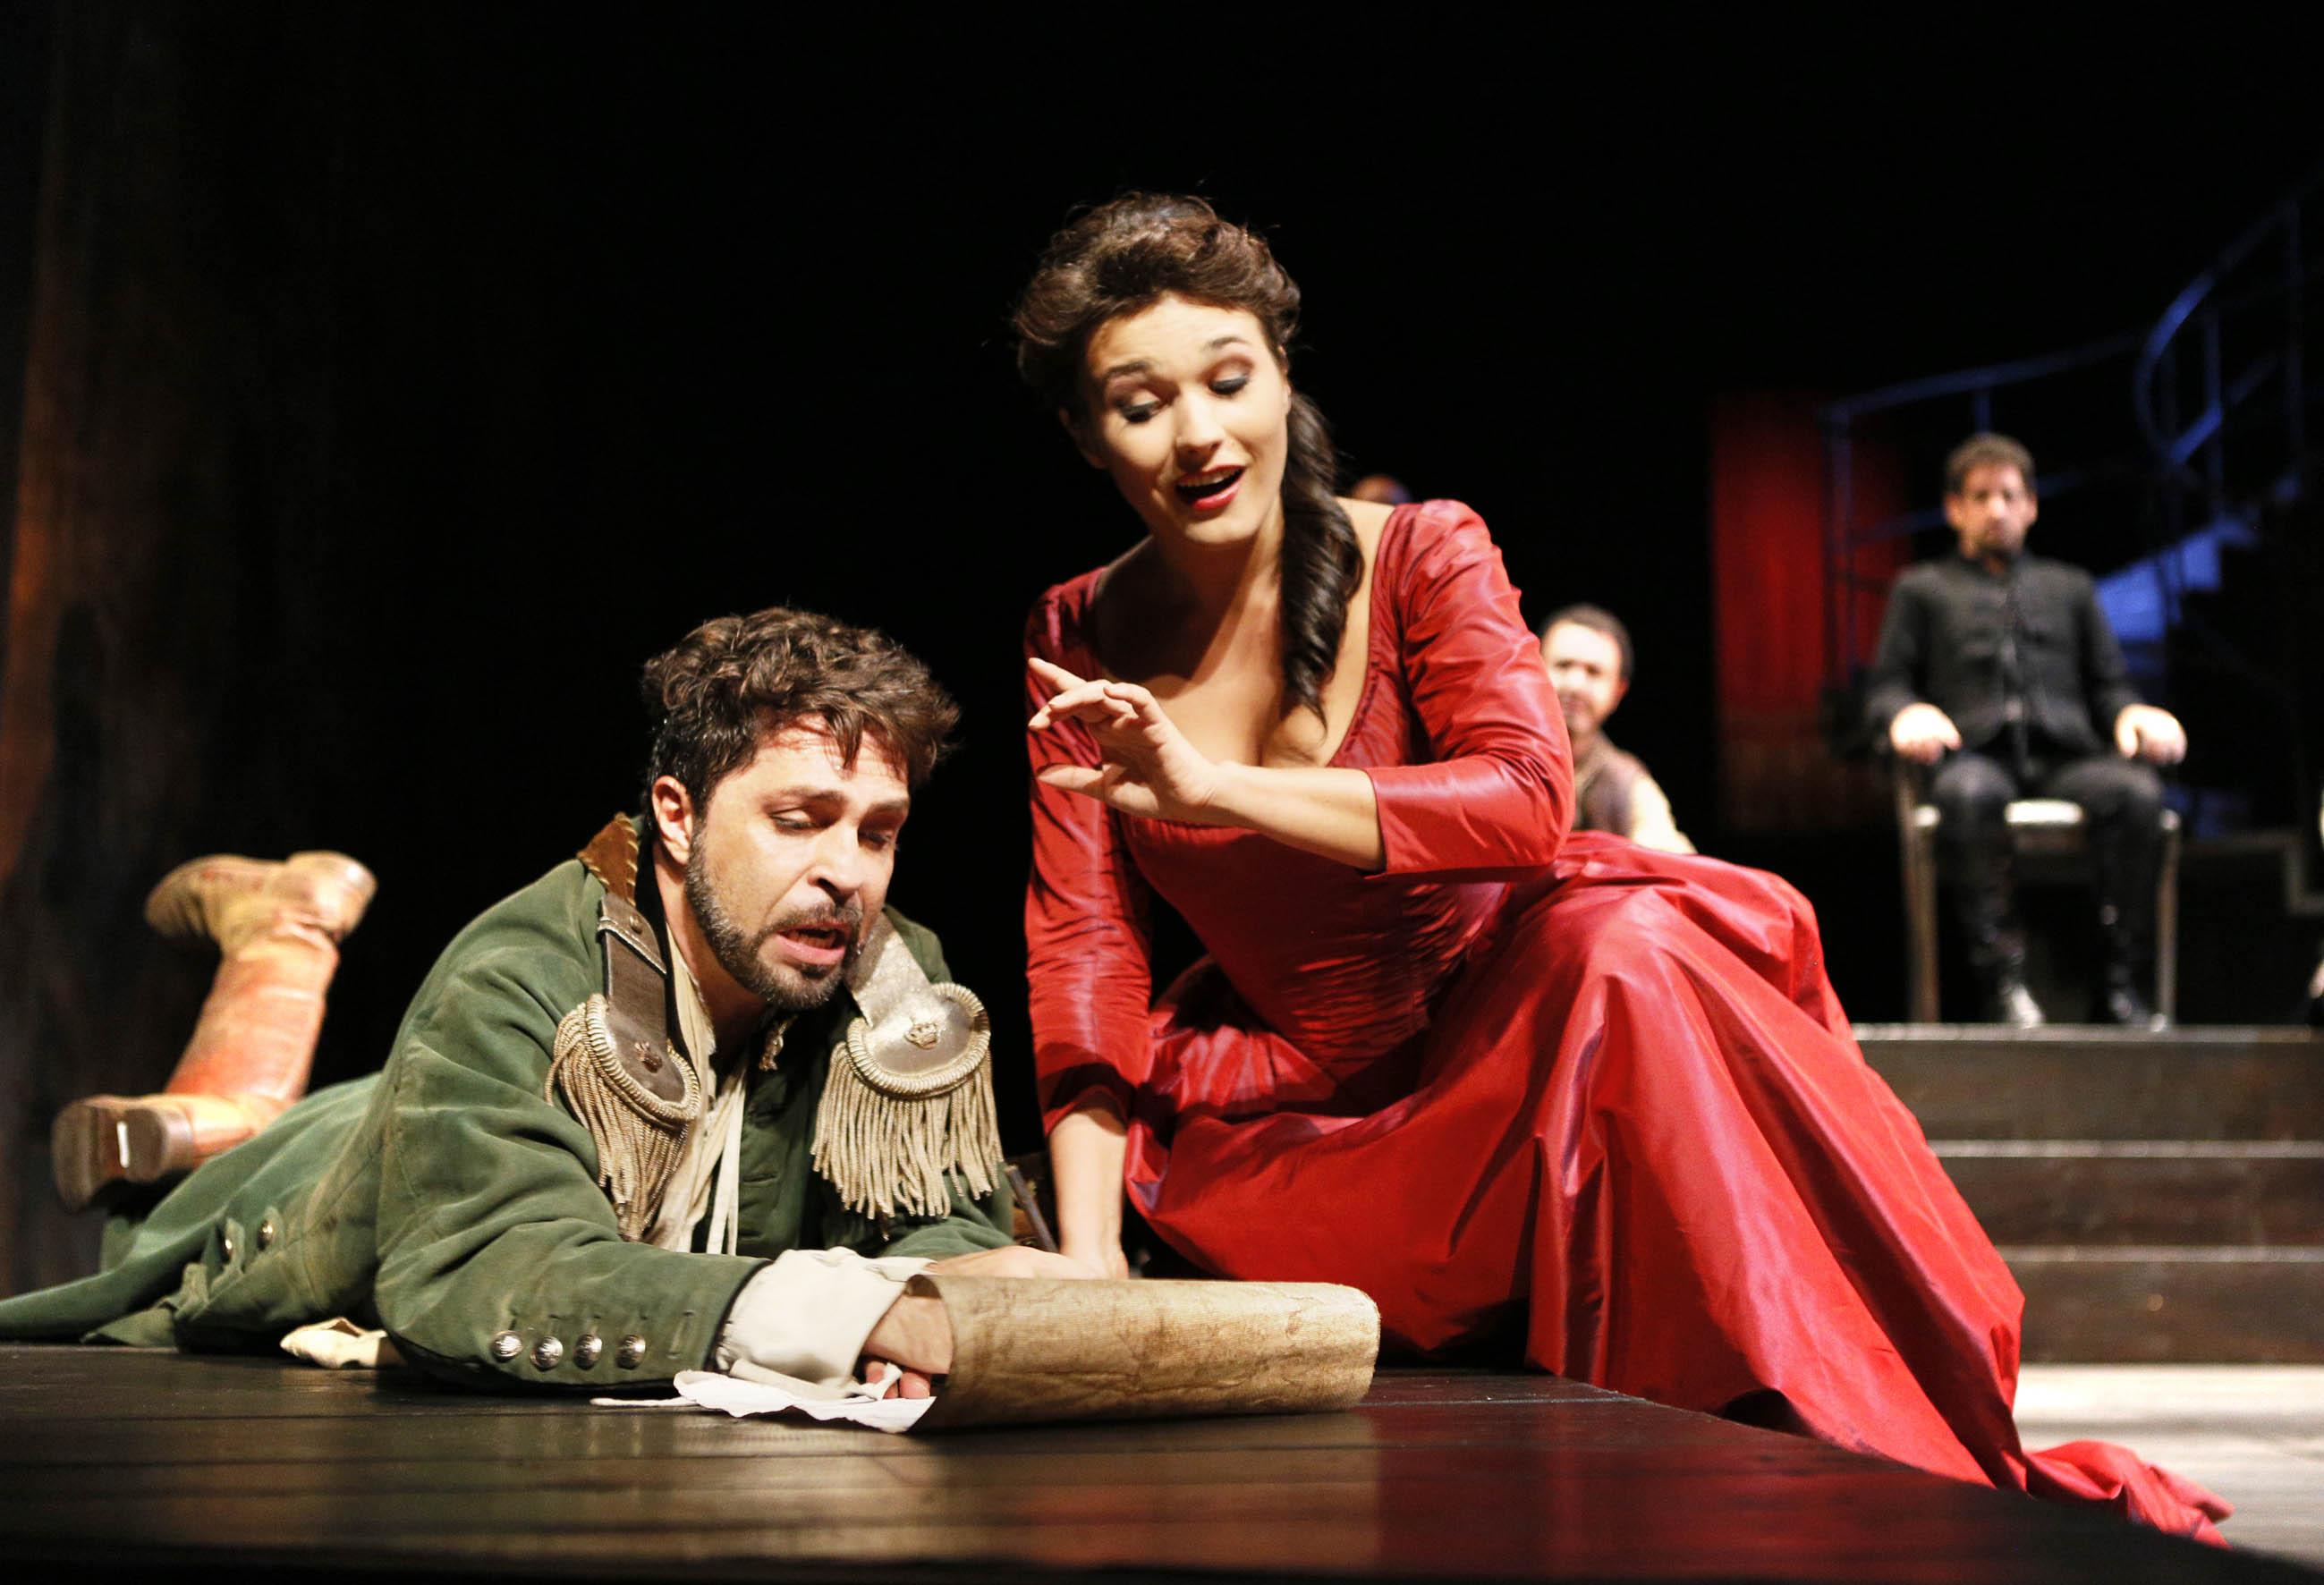 Paolo Bordogna e Olga Peretyatko - Foto Amati Bracciardi